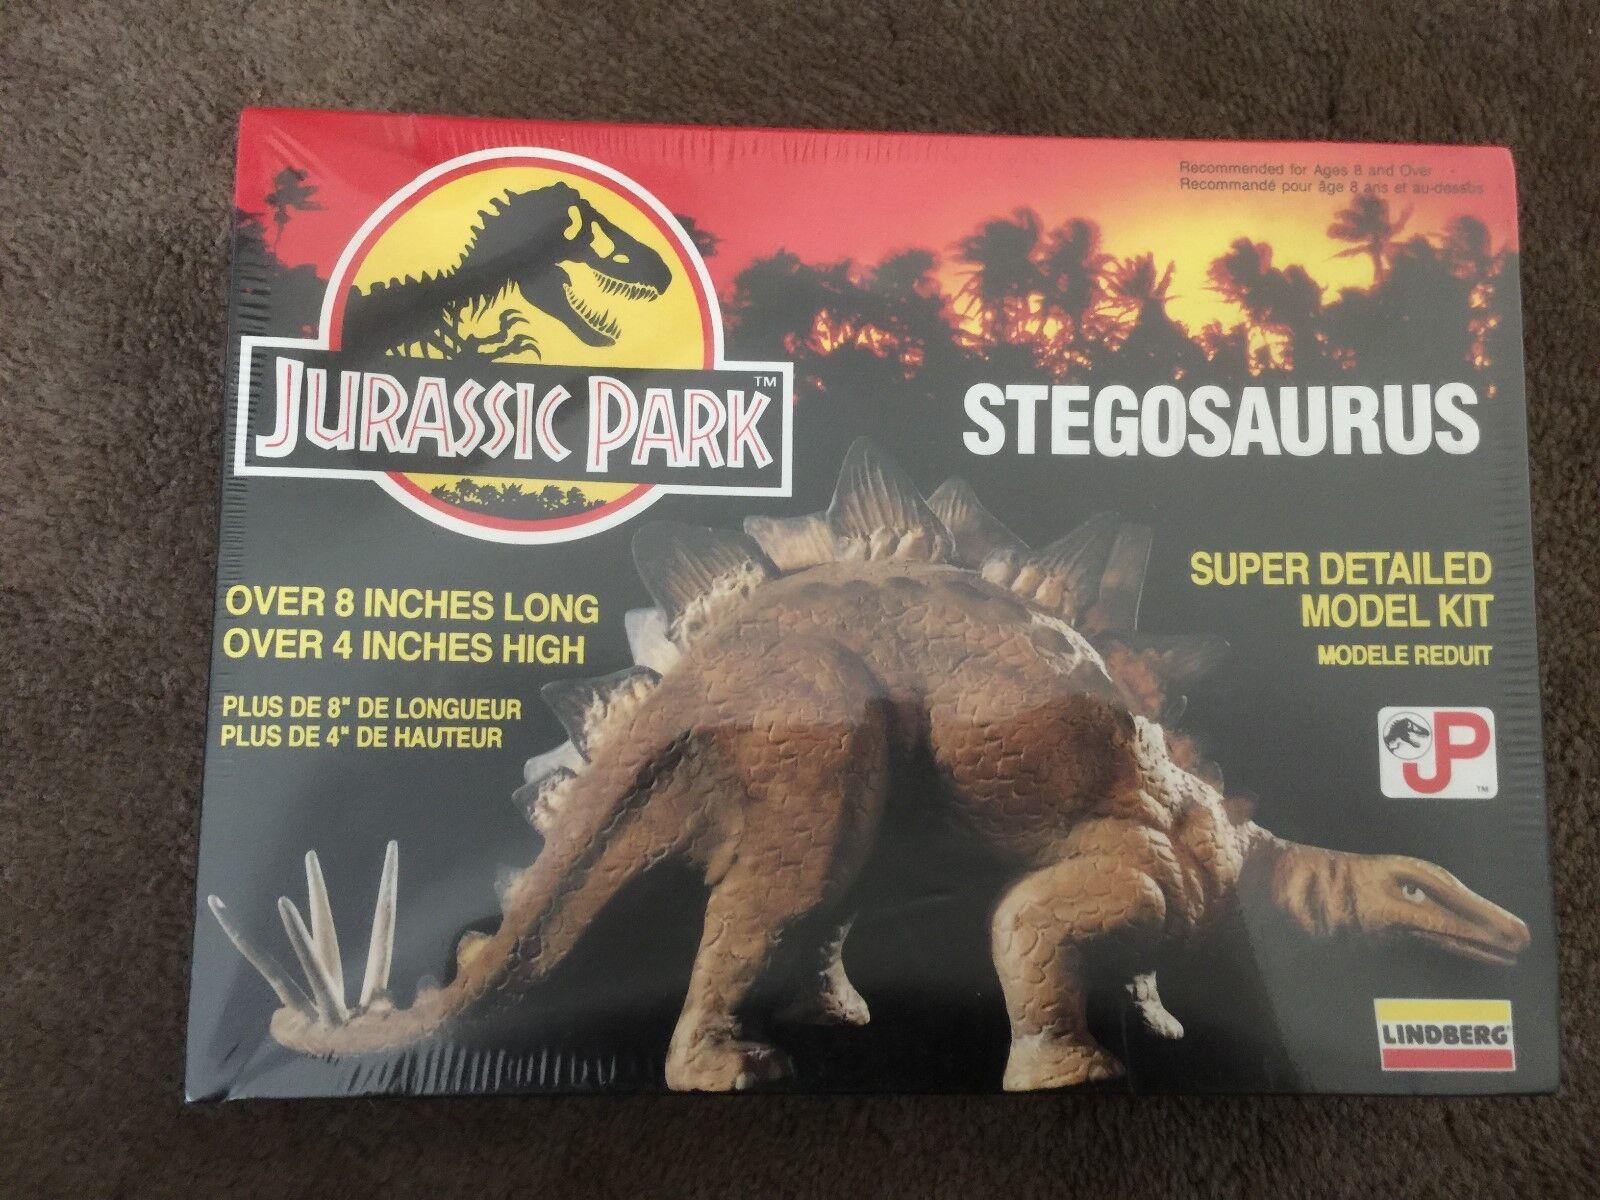 Jurassic Park Stegosaurus Model Kit    Small   8in x 4in   1992 - V Rare